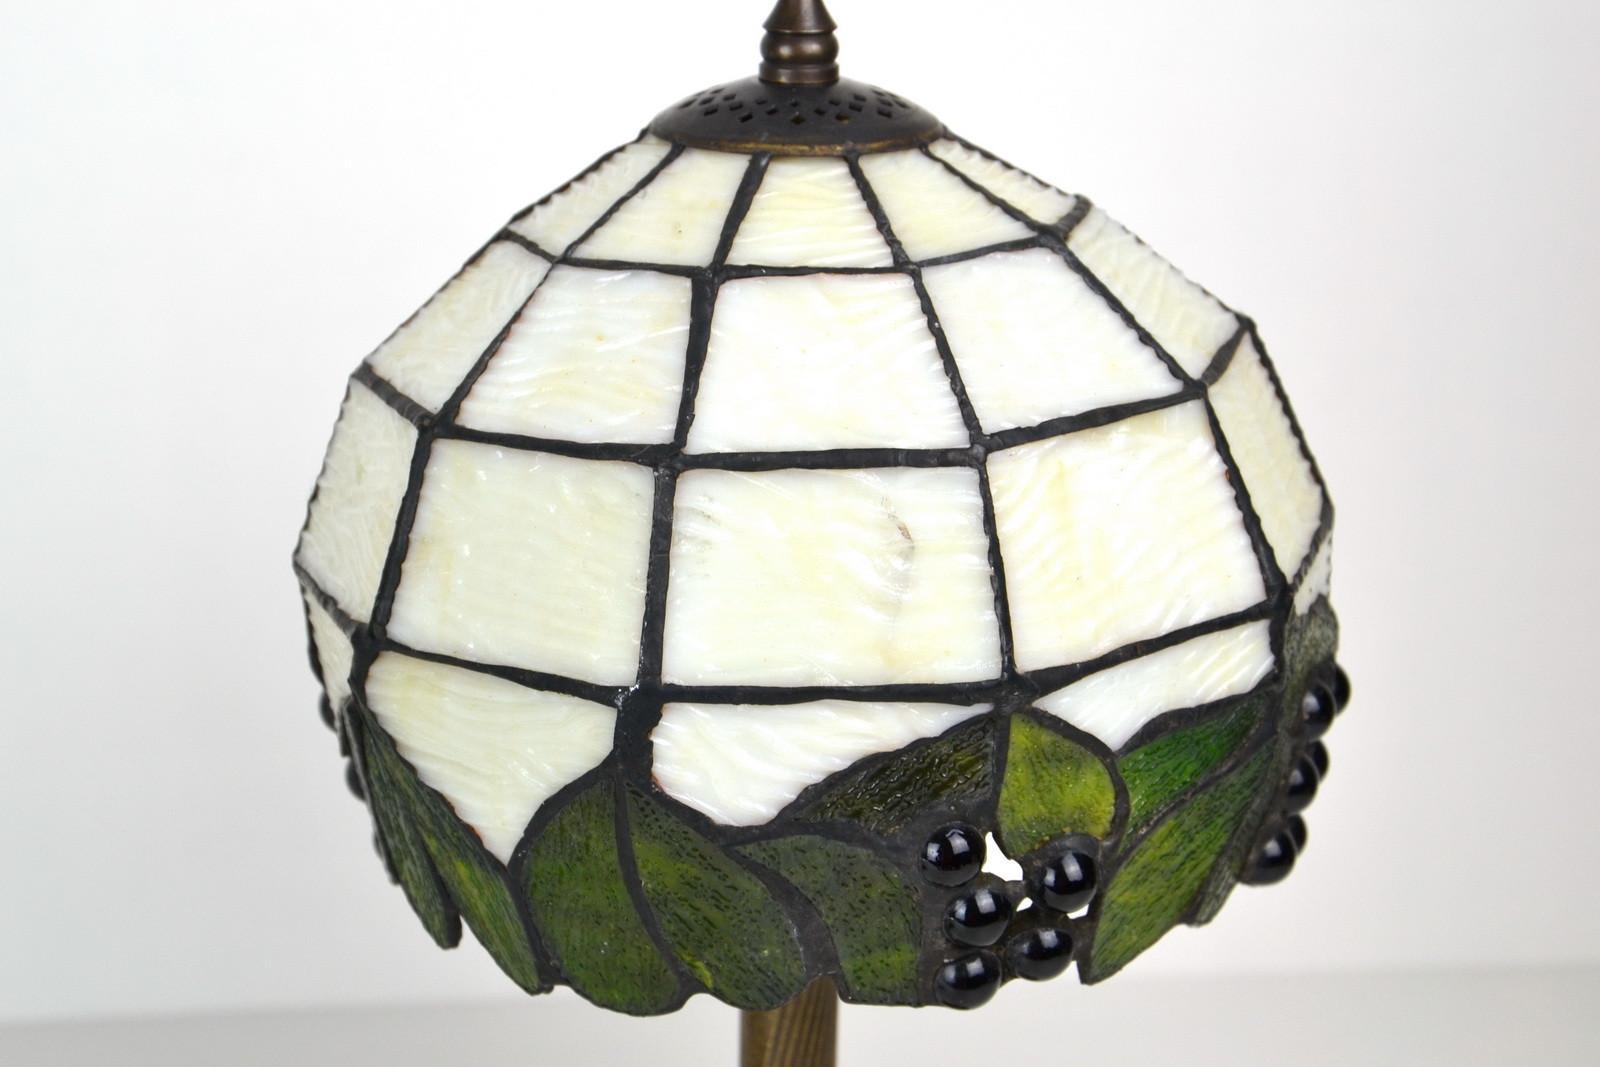 coppia-lampade-tiffany-comodino-09,1566.jpg?WebbinsCacheCounter=1